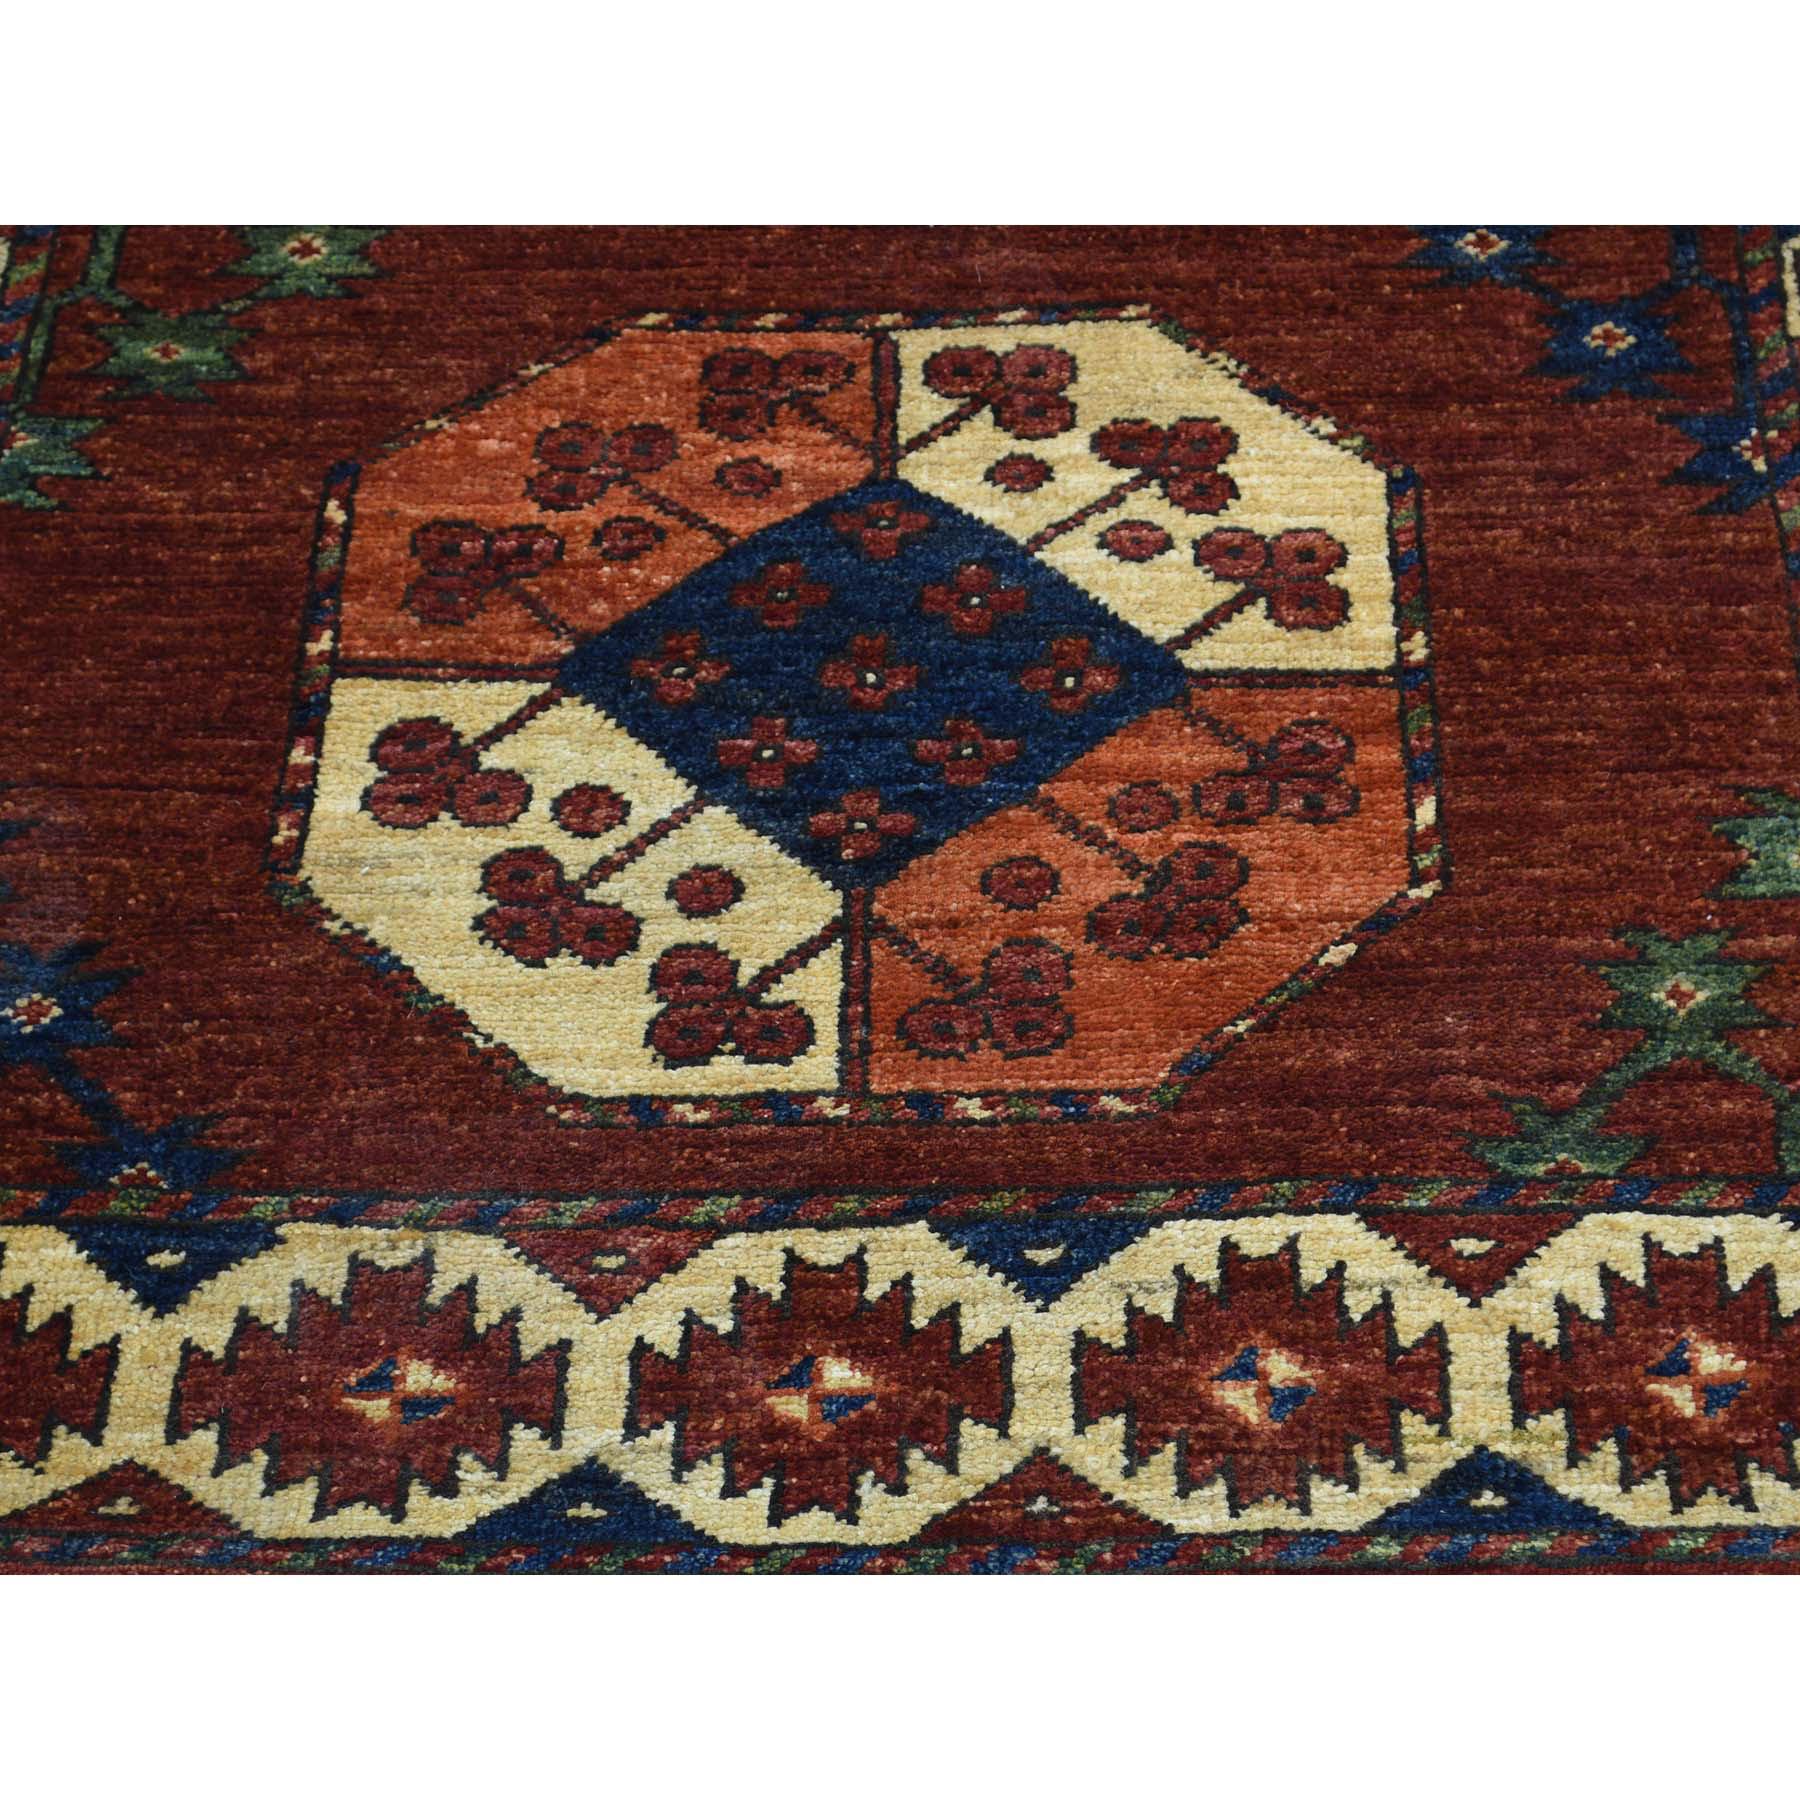 3-x12-7  Hand Knotted Afghan Ersari Elephant Feet Design Runner Rug